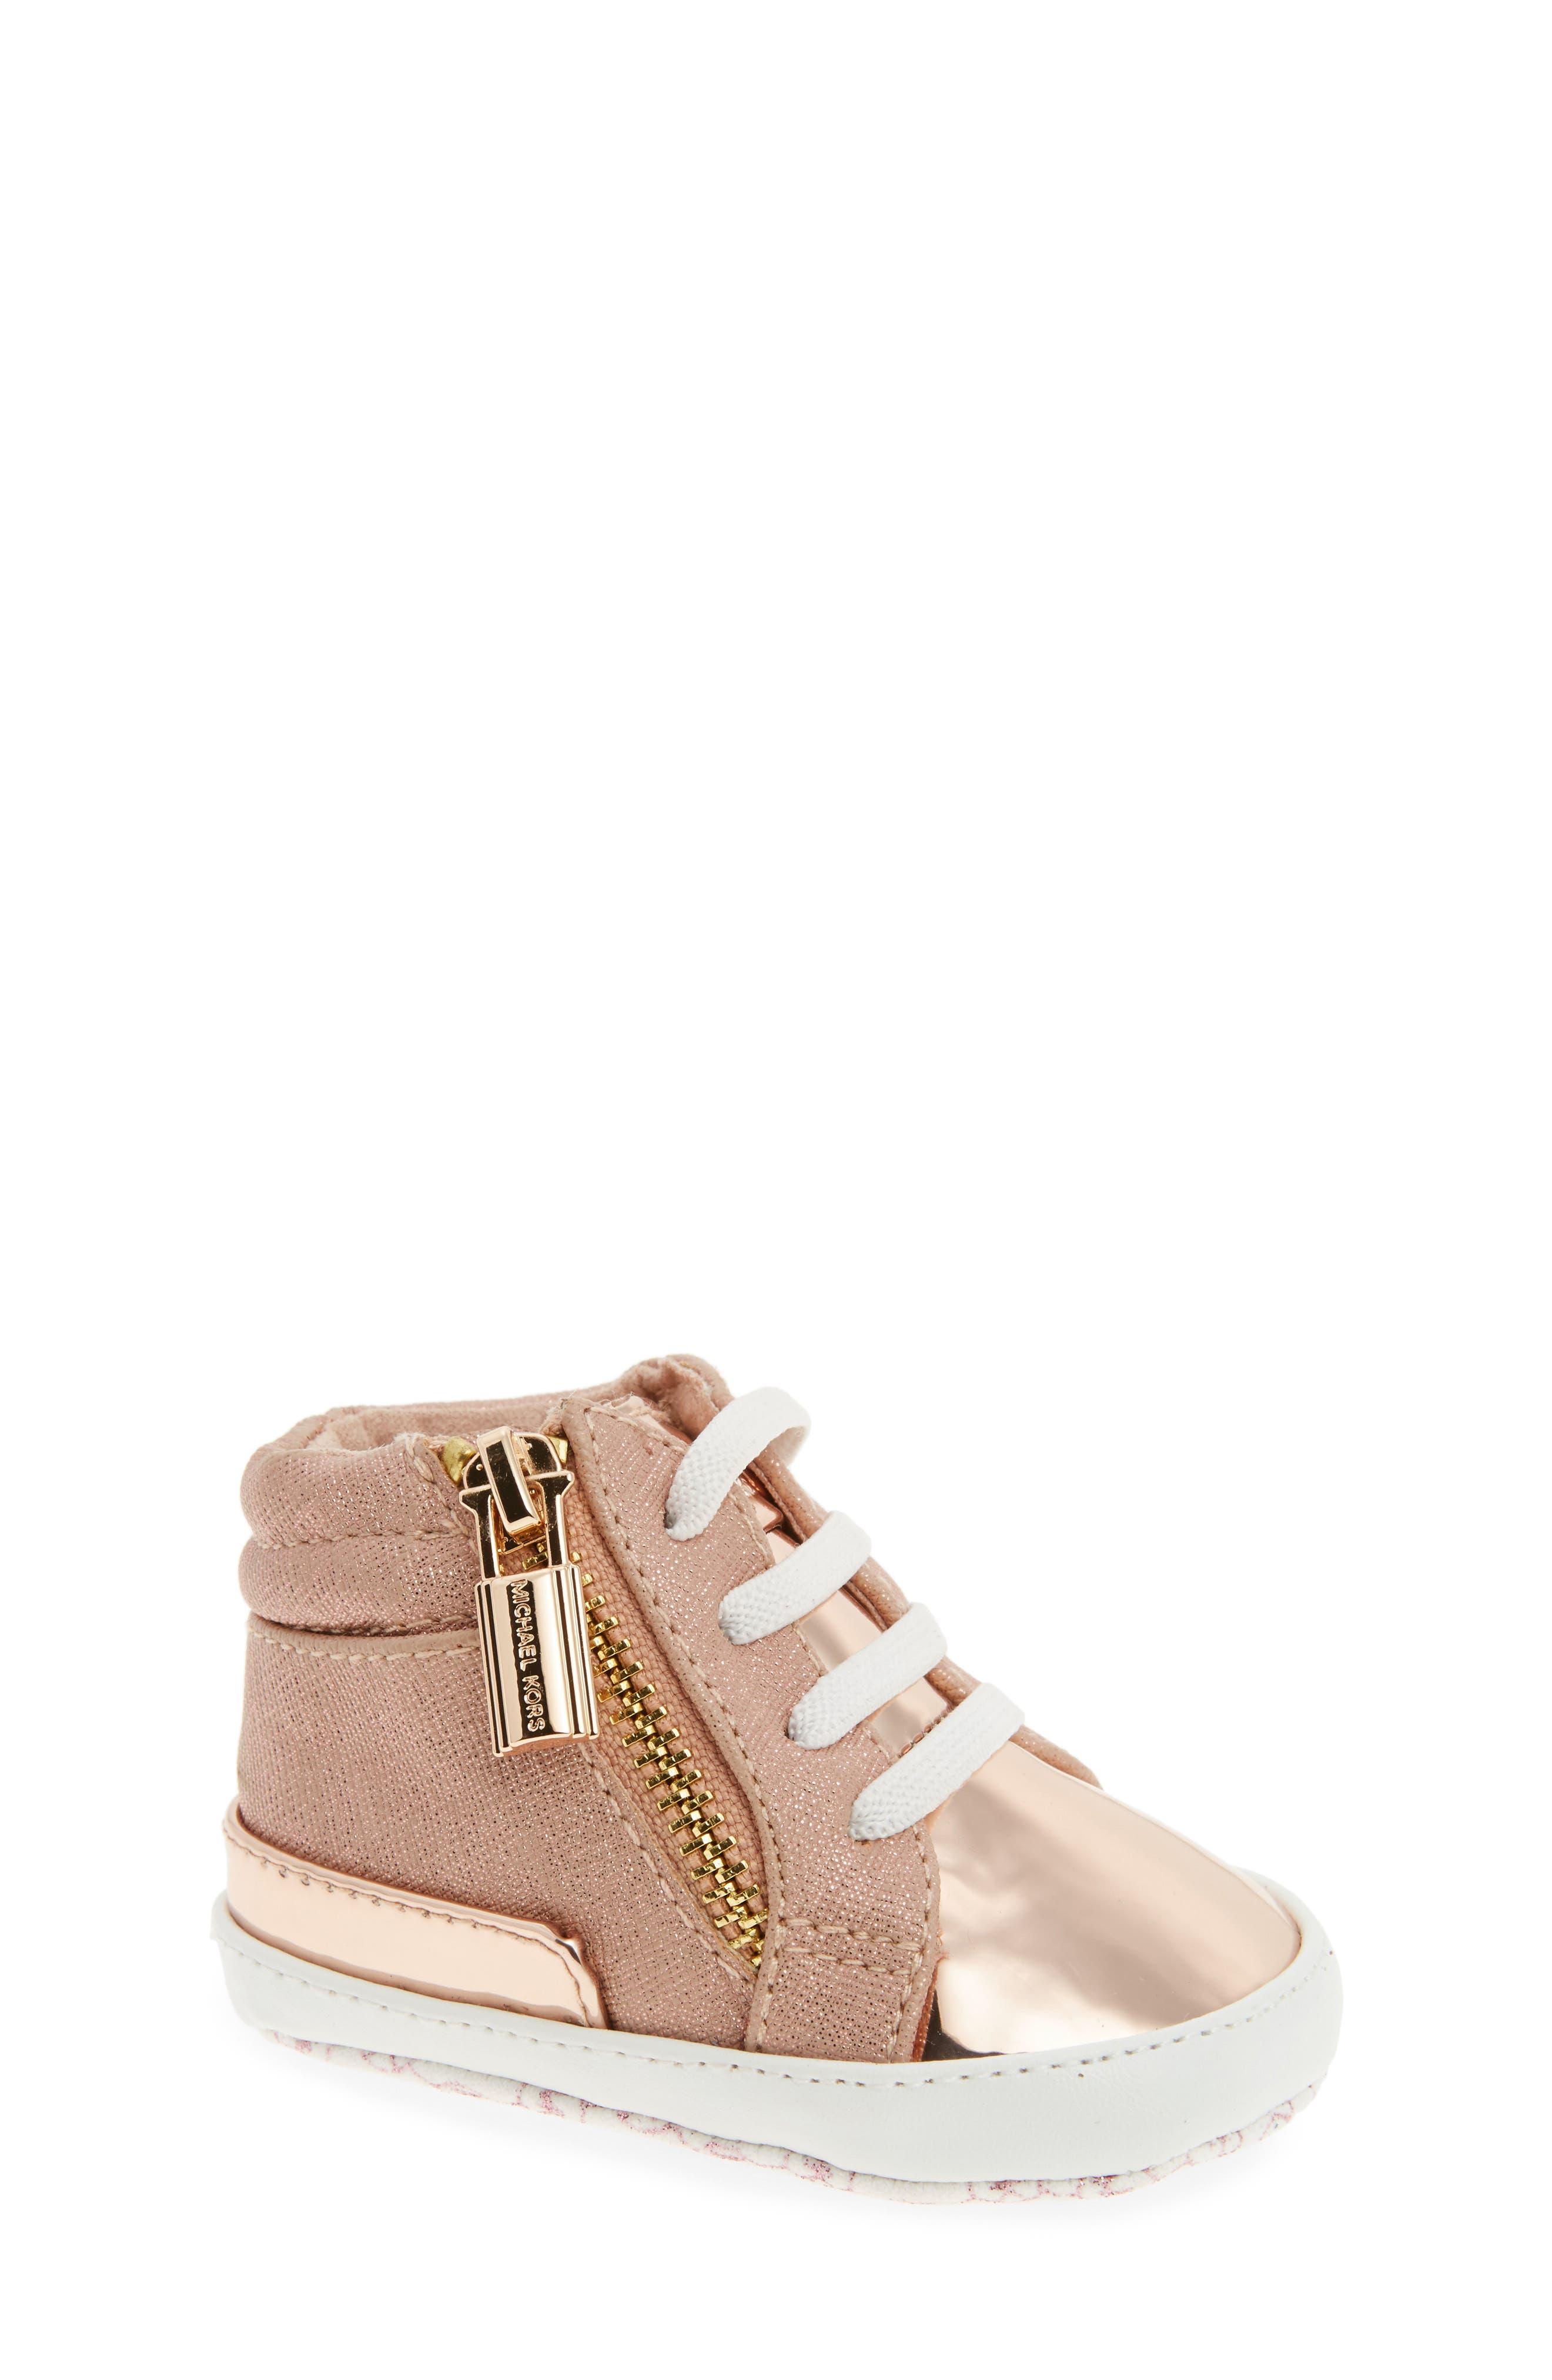 MICHAEL Michael Kors Baby Bleu High-Top Crib Shoe (Baby)